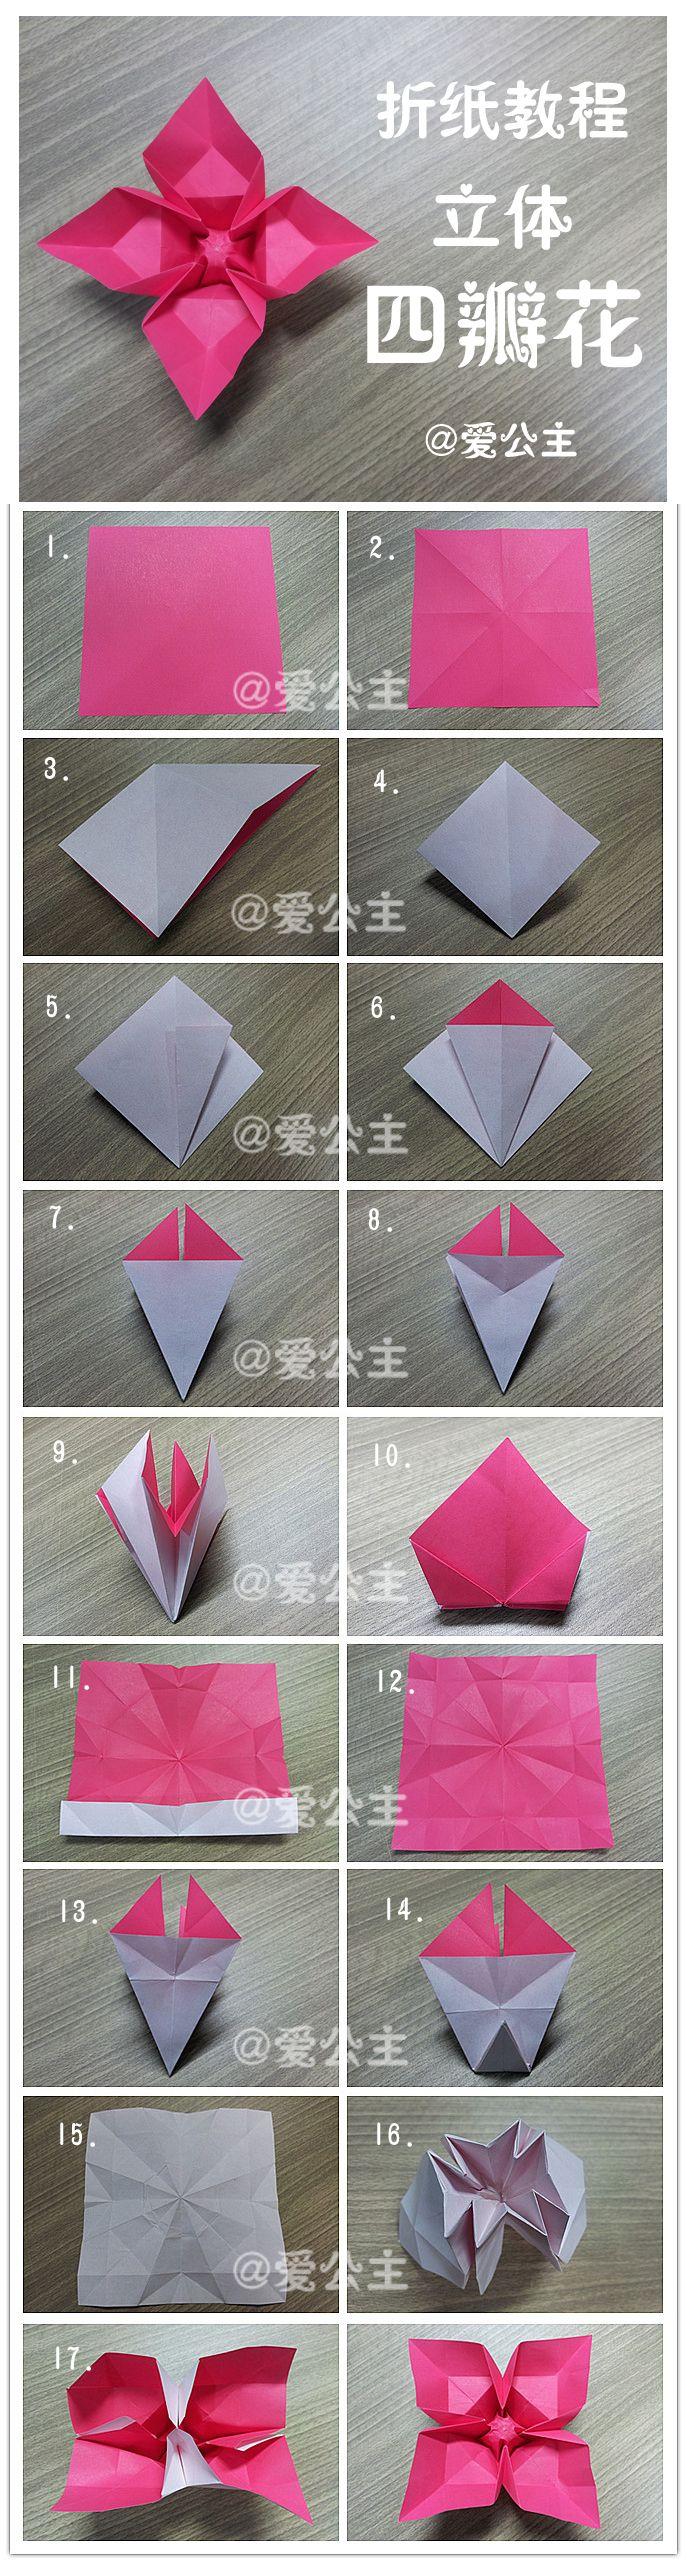 Flor 4 Petalos Origami Pinterest Origami Craft And Flower